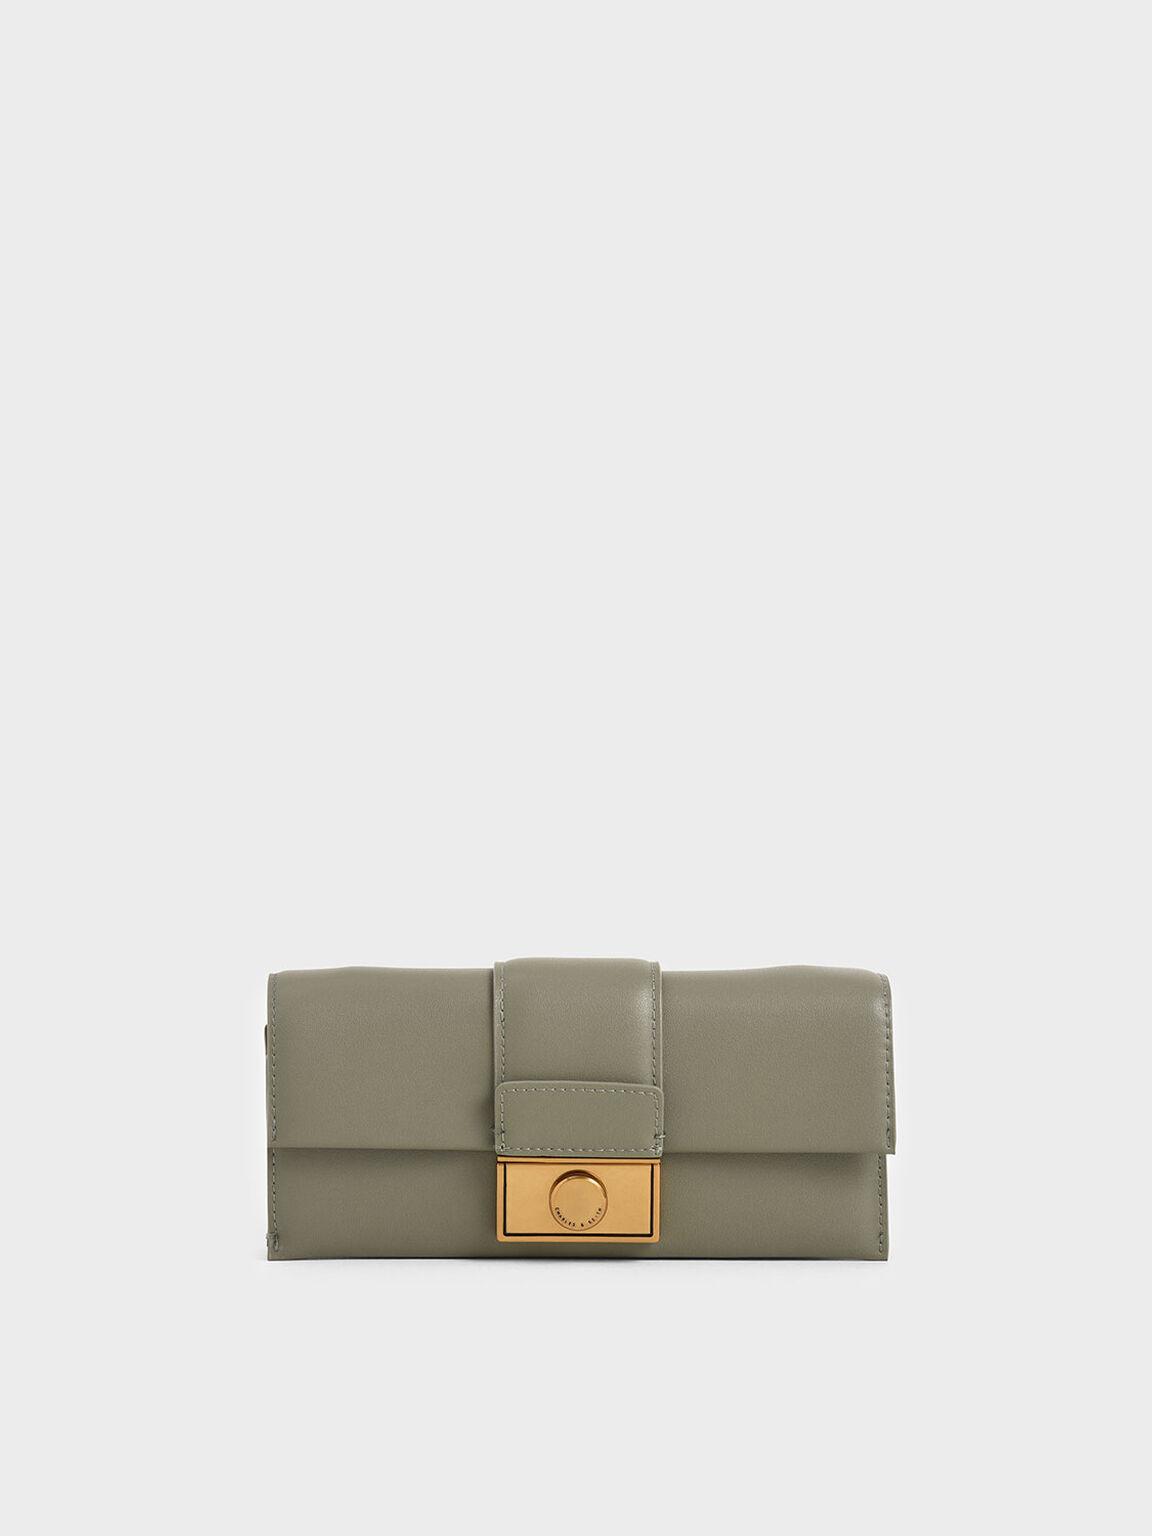 Push-Lock Long Wallet, Sage Green, hi-res